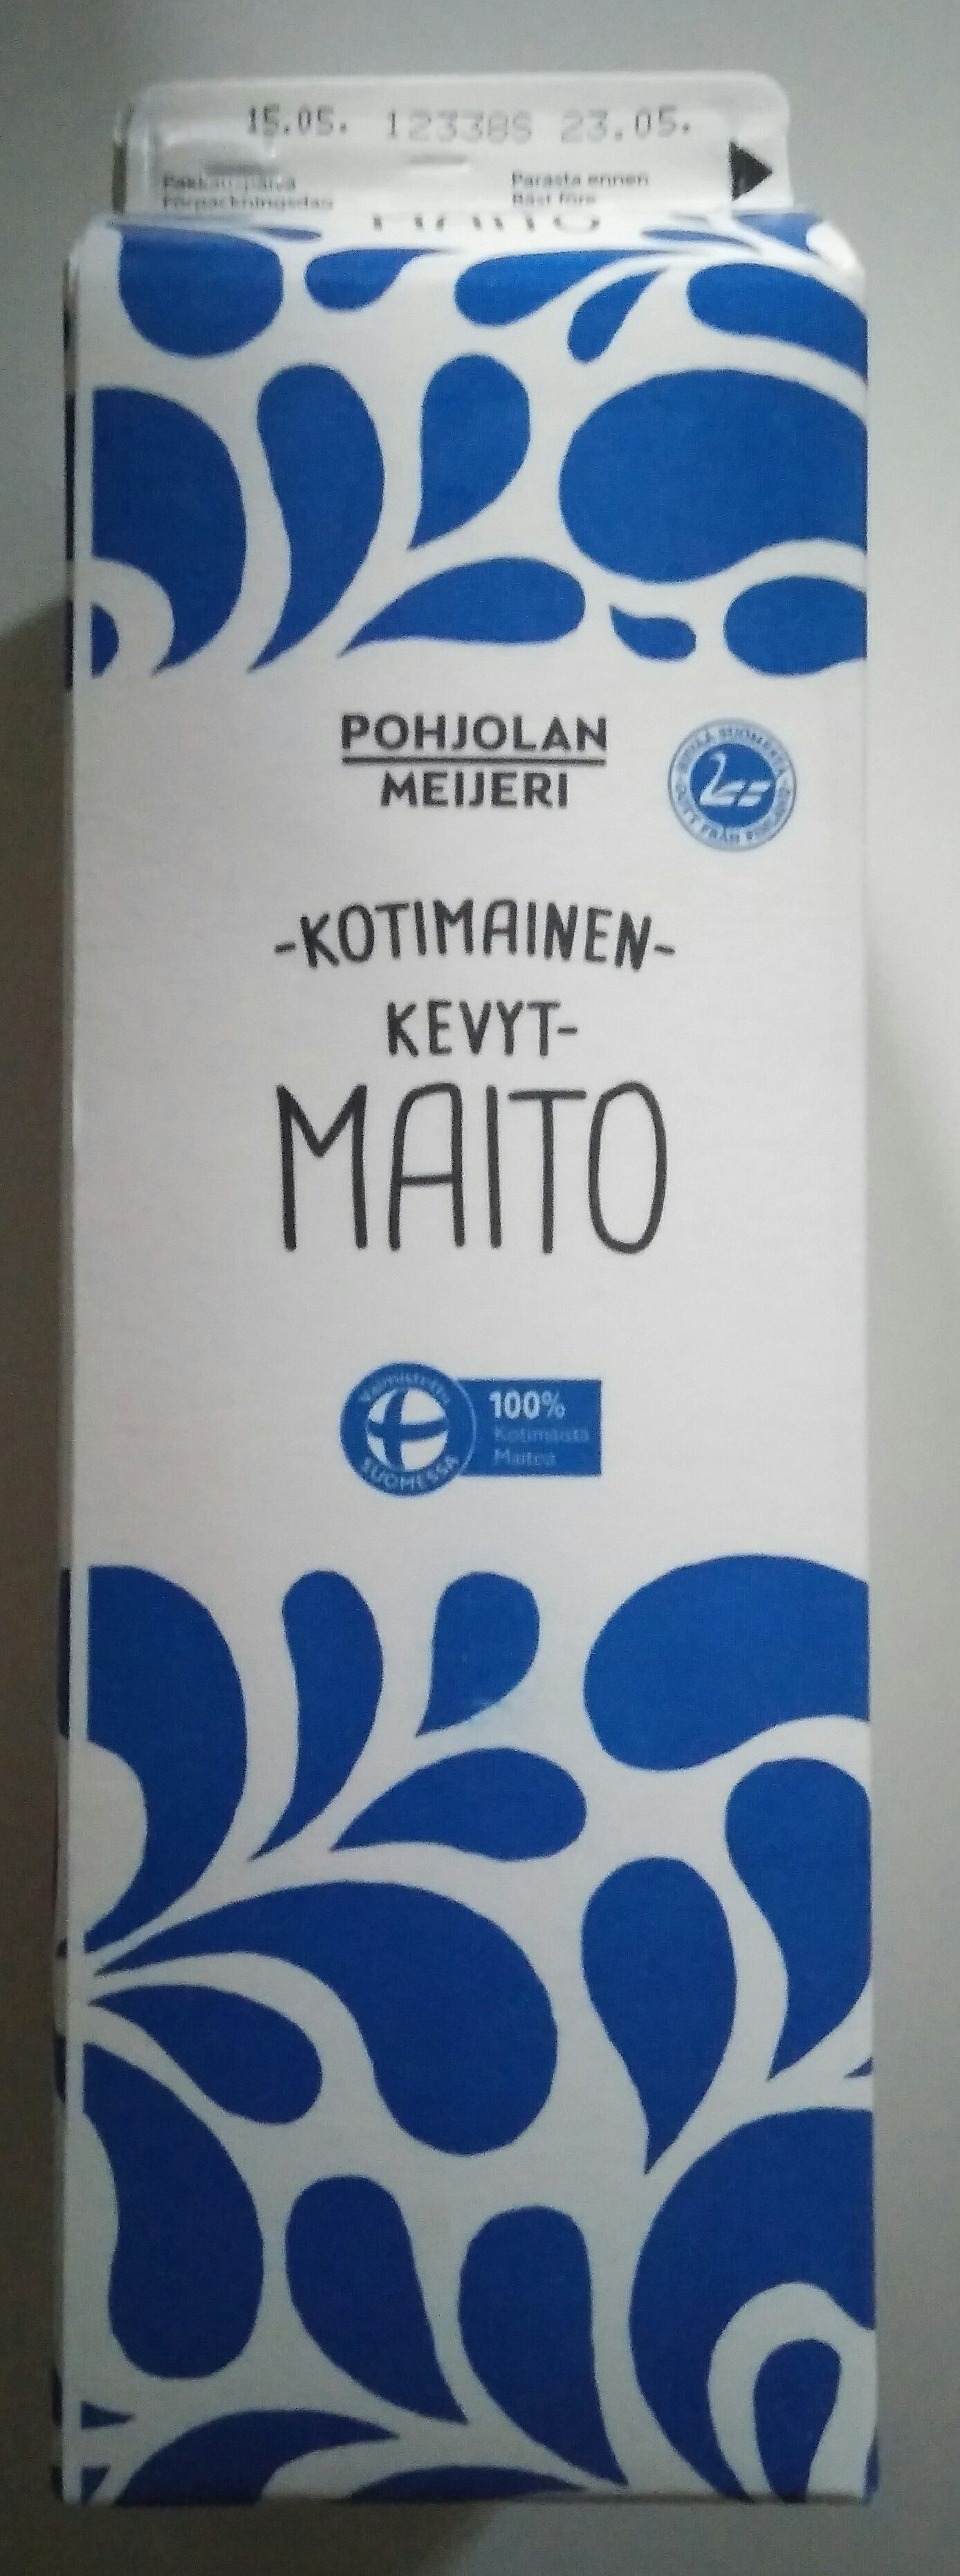 Kotimainen Kevytmaito - Product